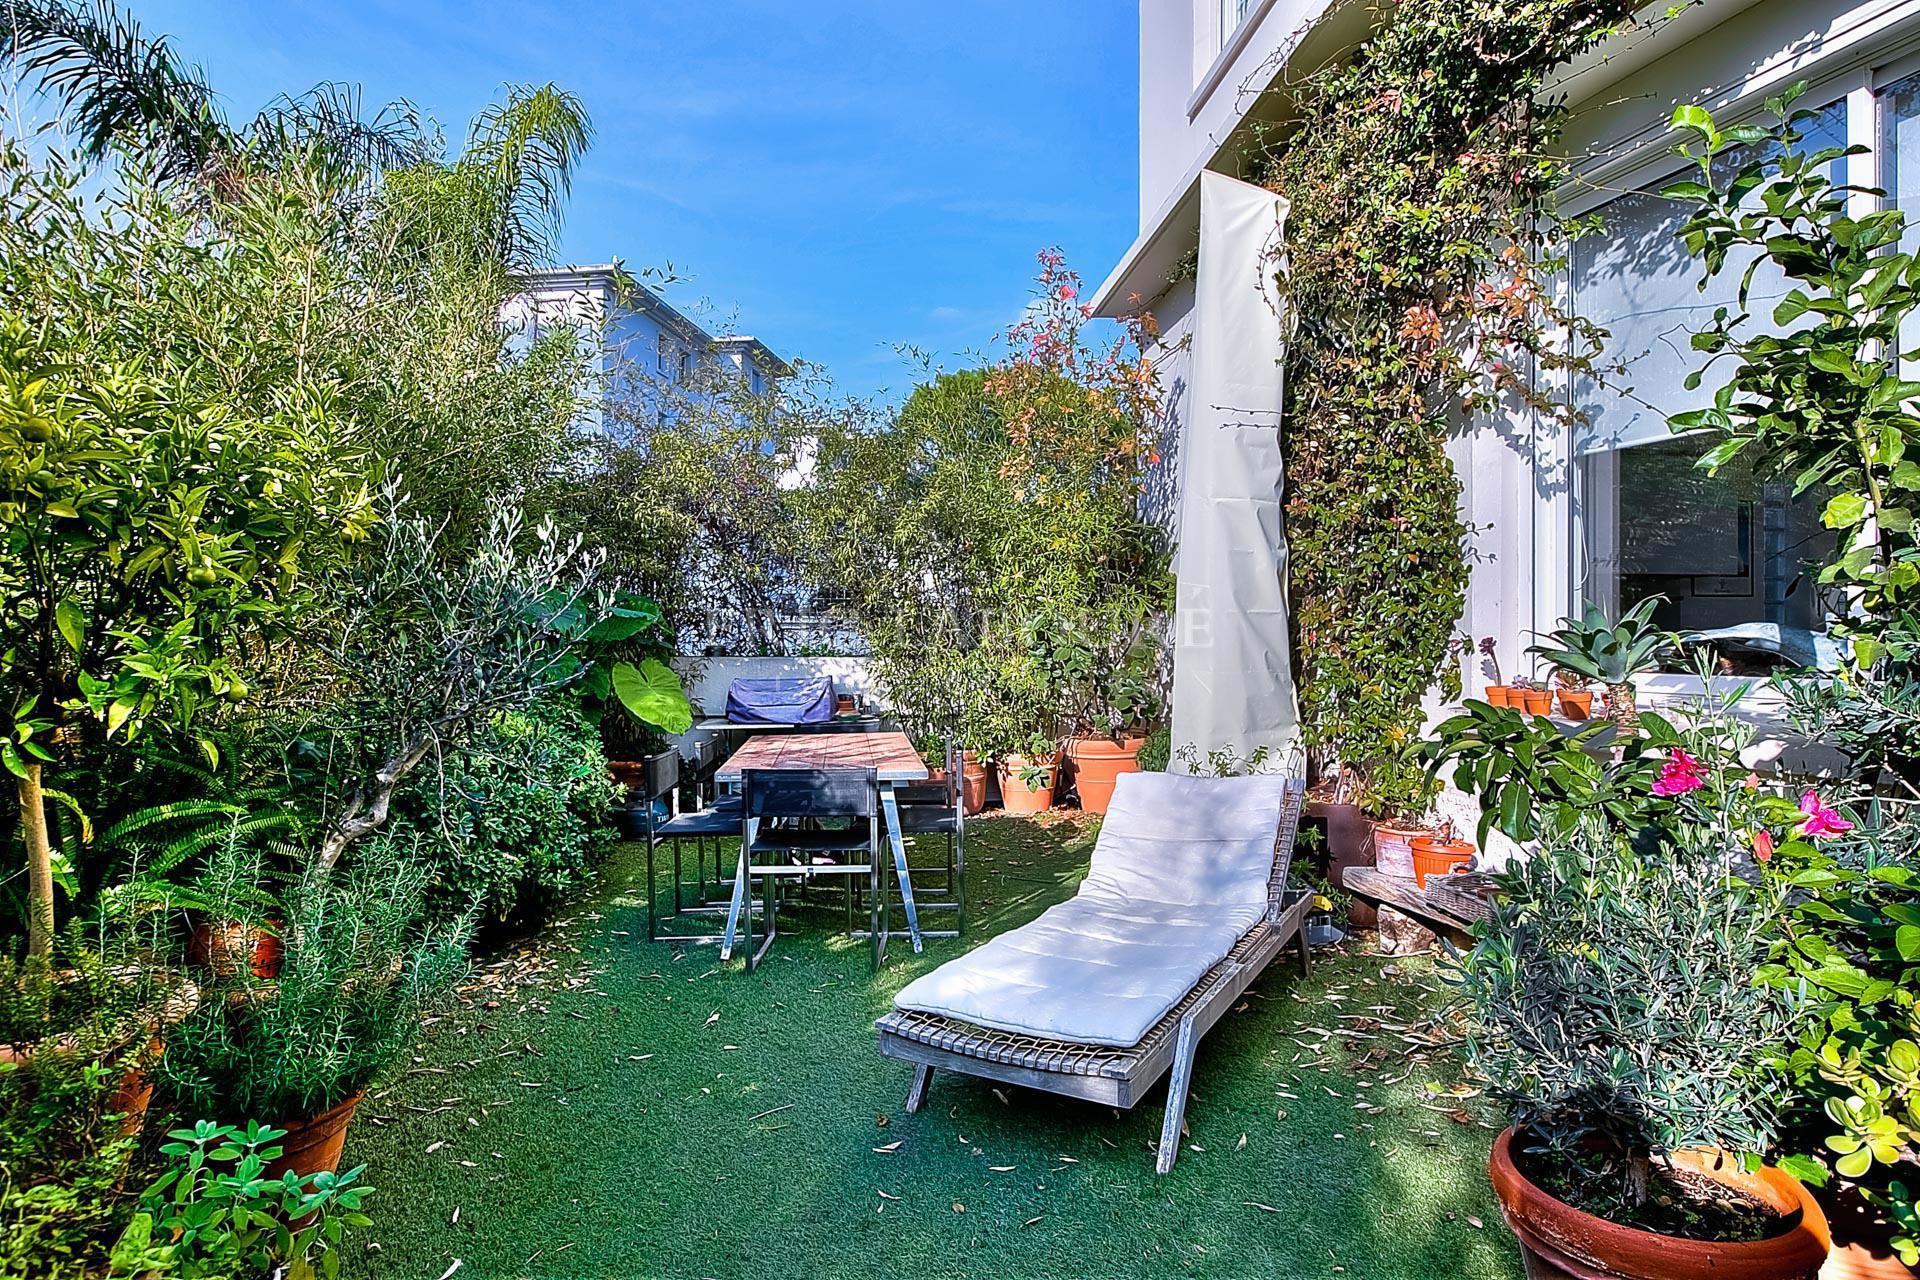 Vente appartement Cannes Gallia - Grande terrasse